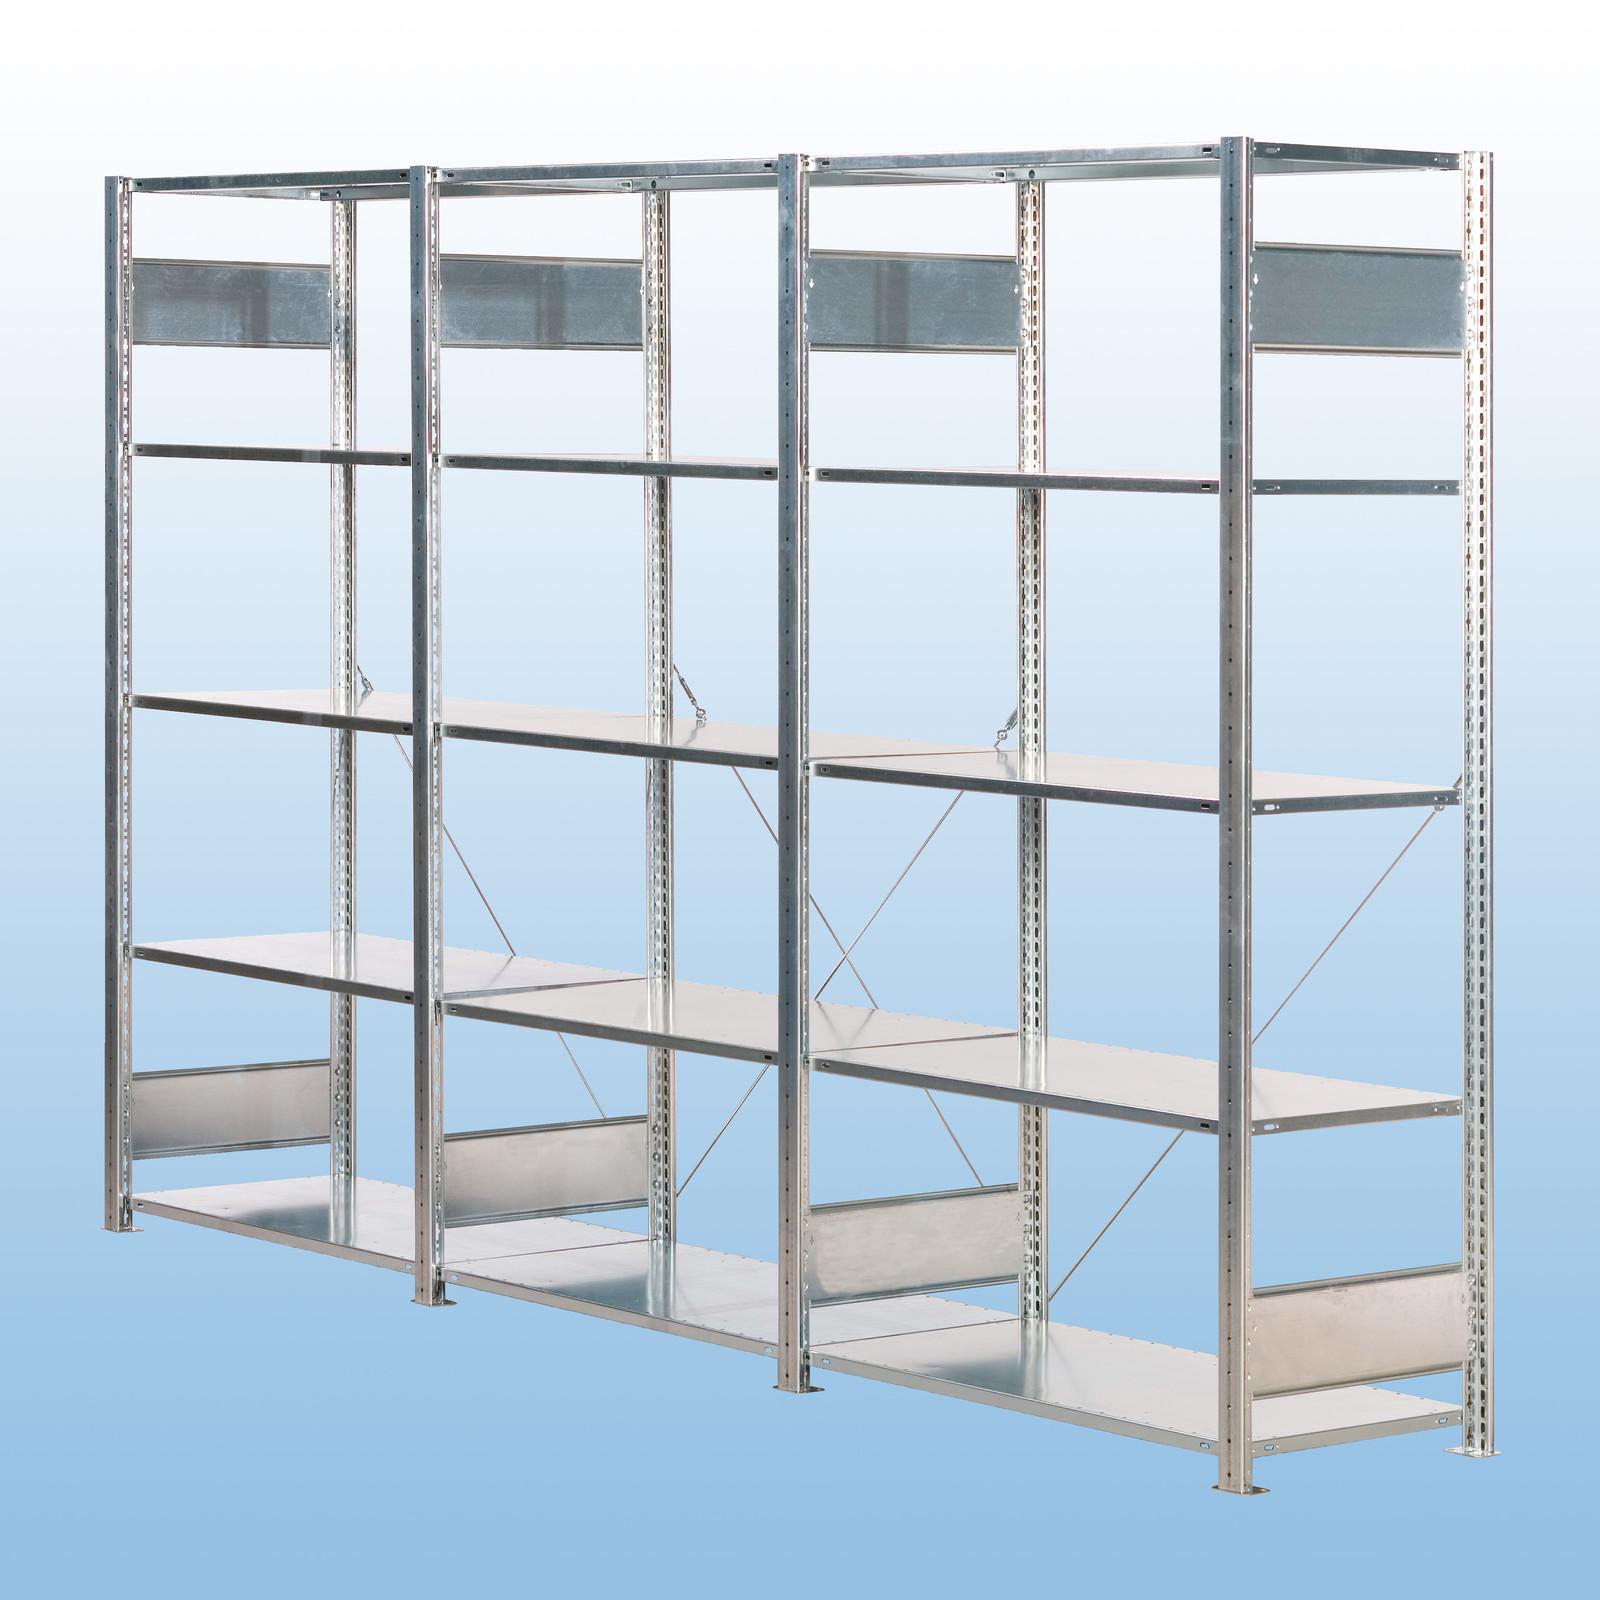 s20 fachbodenregal stecksystem verzinkt regalaktionen bei kaiser systeme. Black Bedroom Furniture Sets. Home Design Ideas